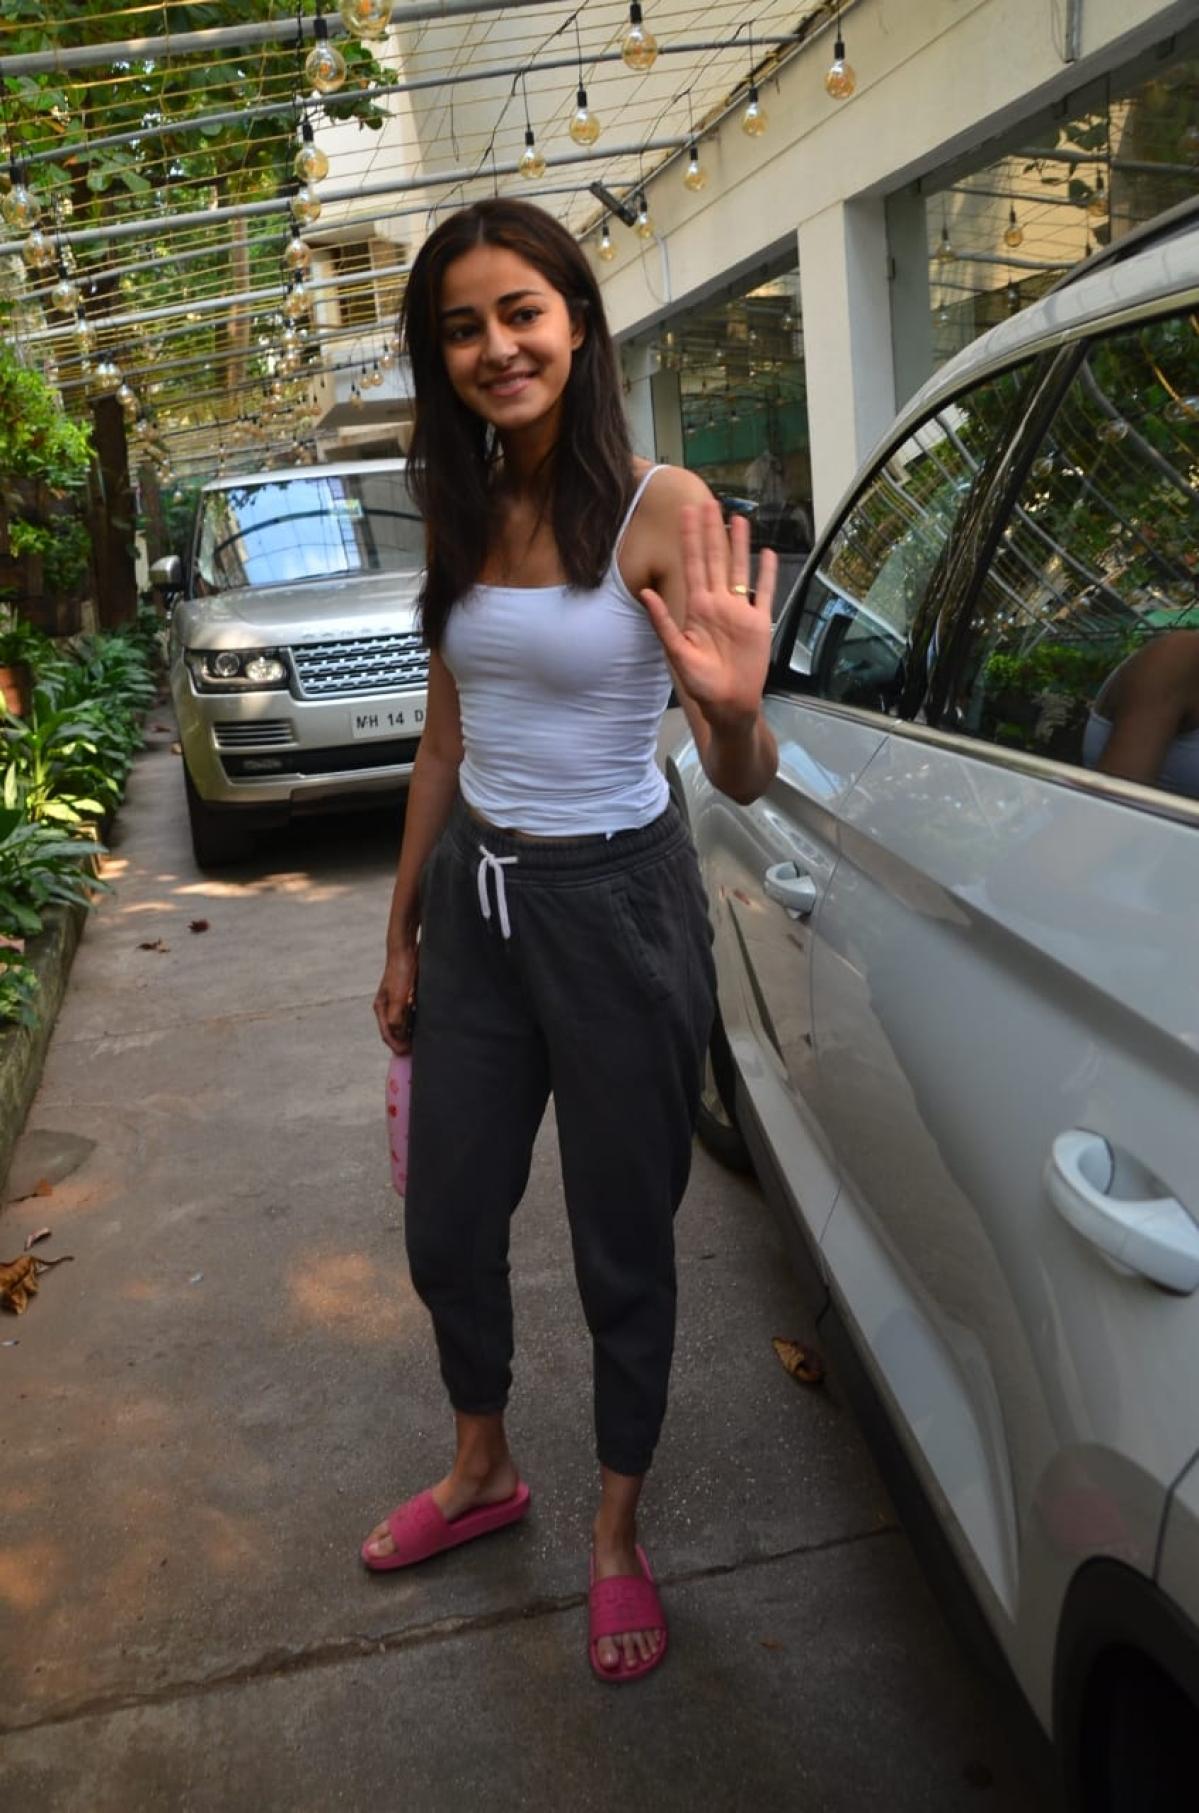 Janhvi Kapoor, Malaika Arora, Genelia Deshmukh have no excuse to bunk the gym today